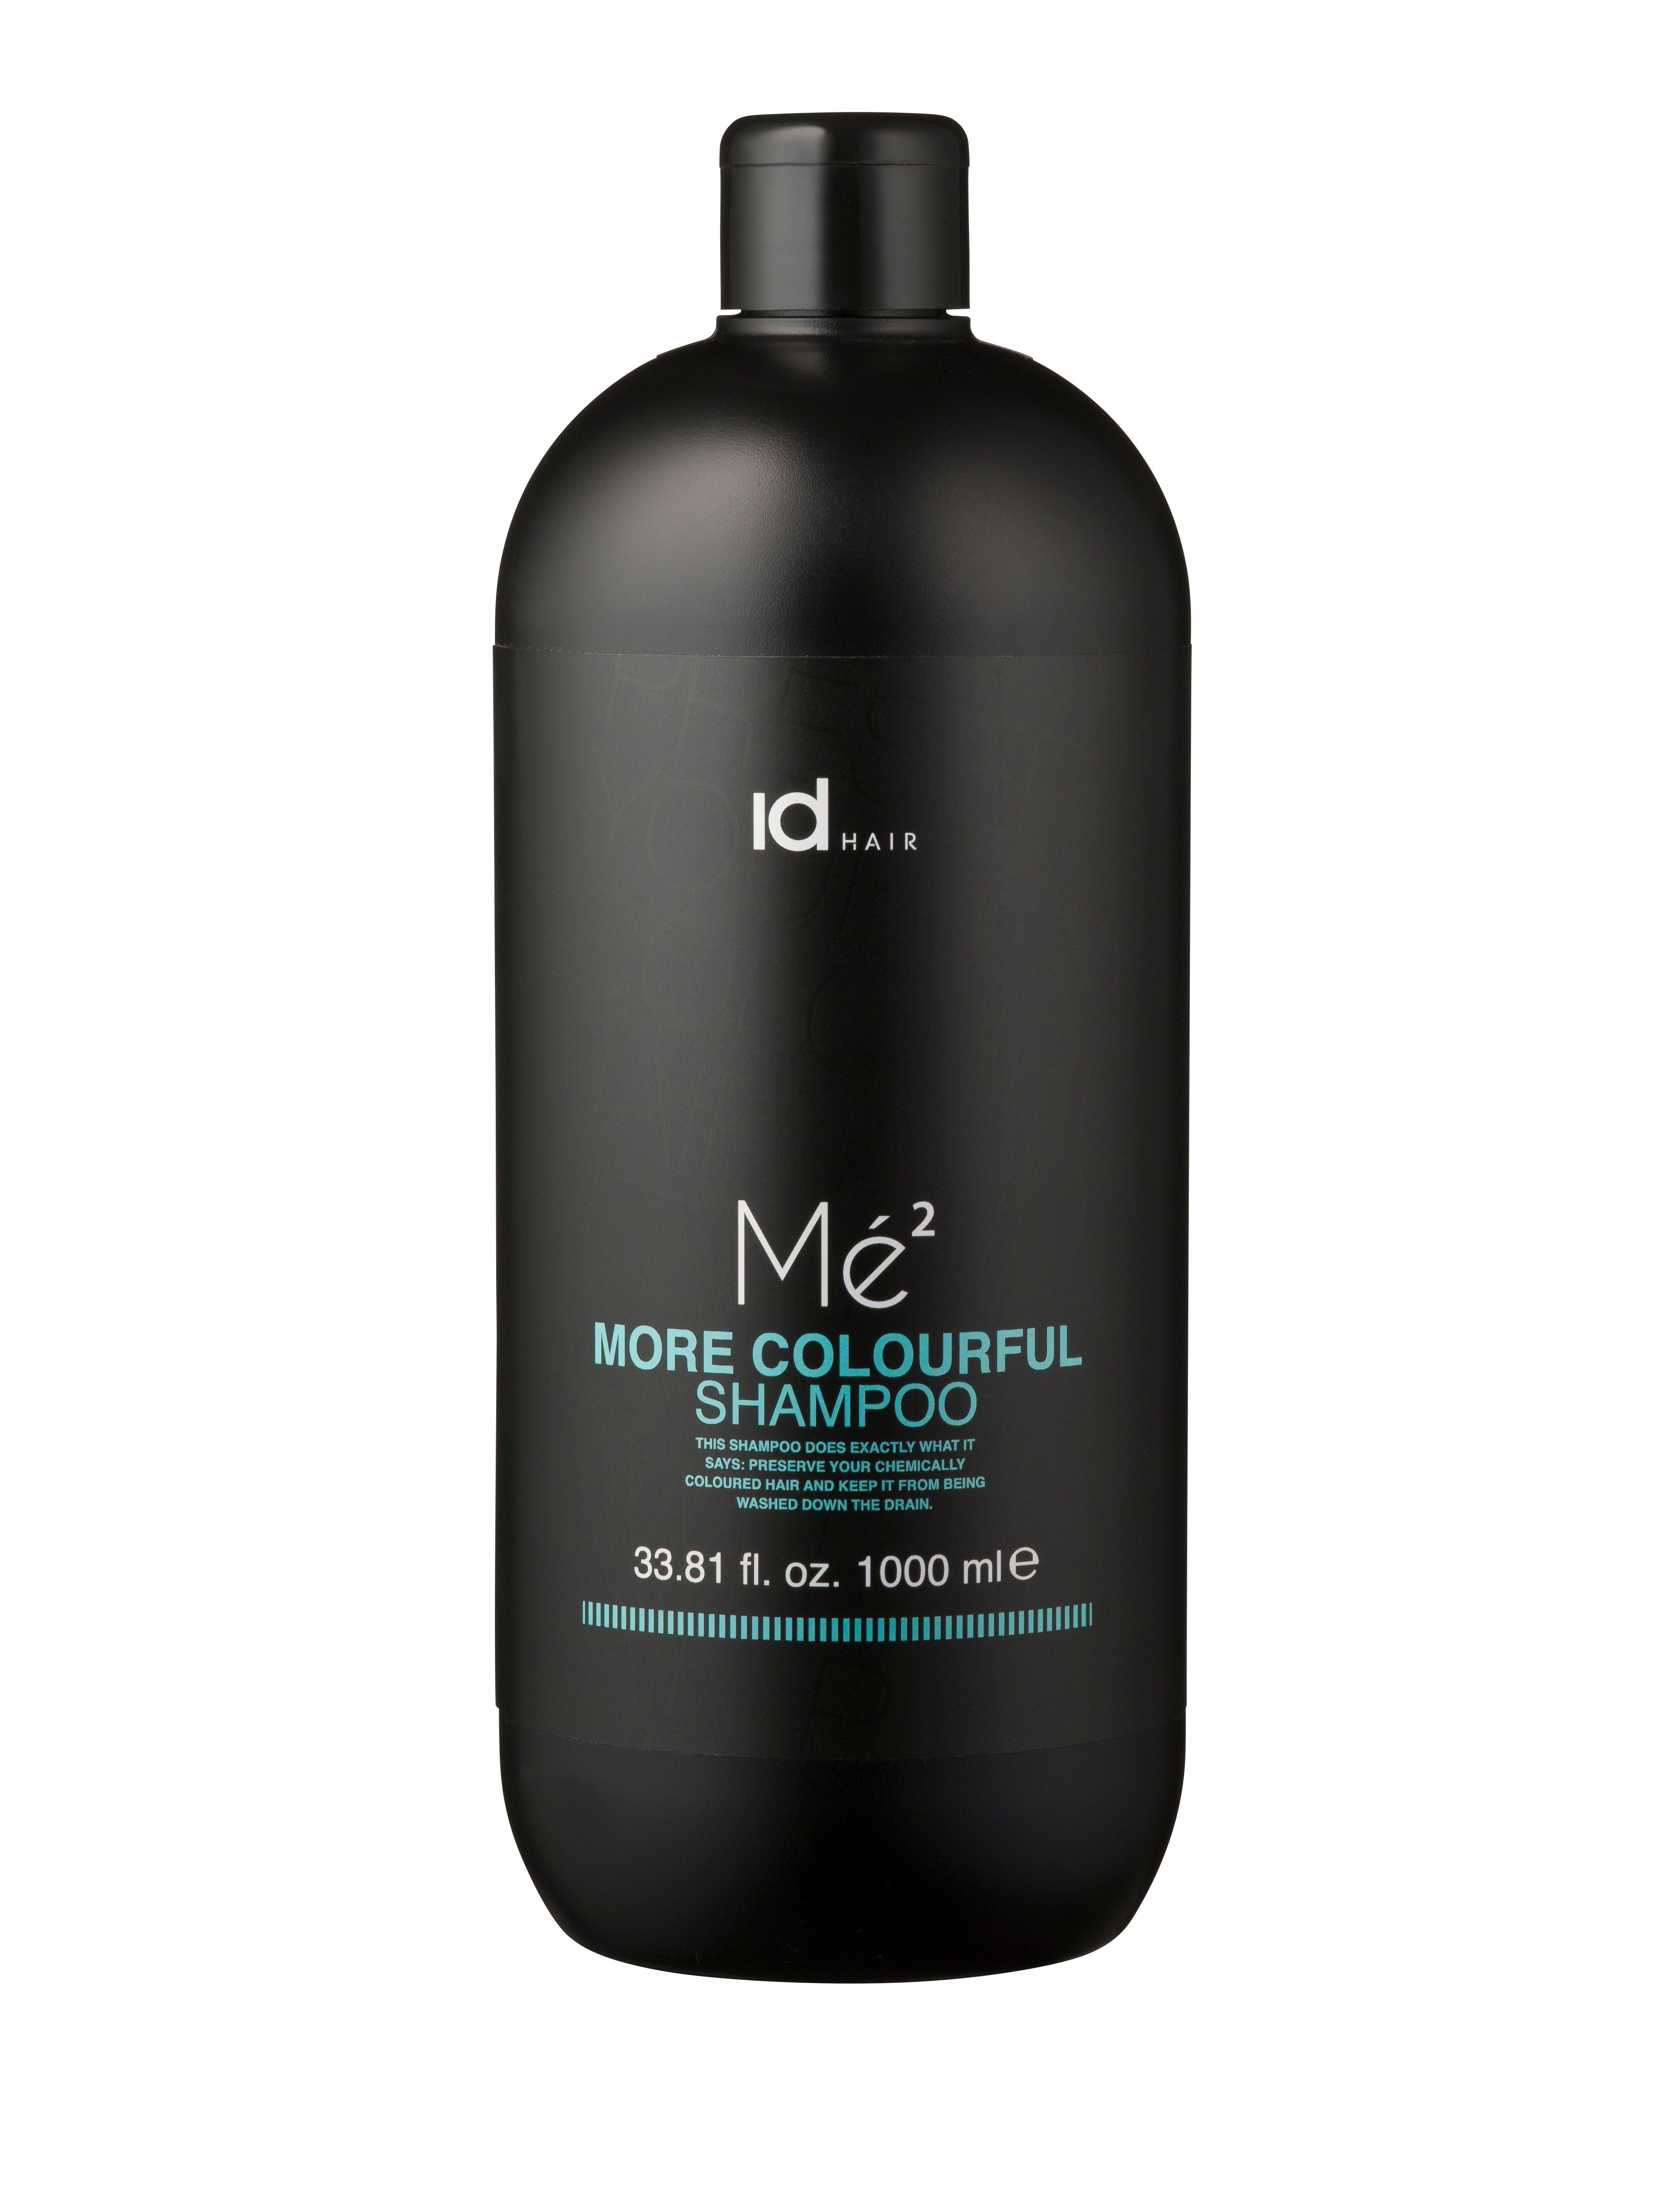 IdHAIR - Mé2 Shampoo Colour 1000 ml